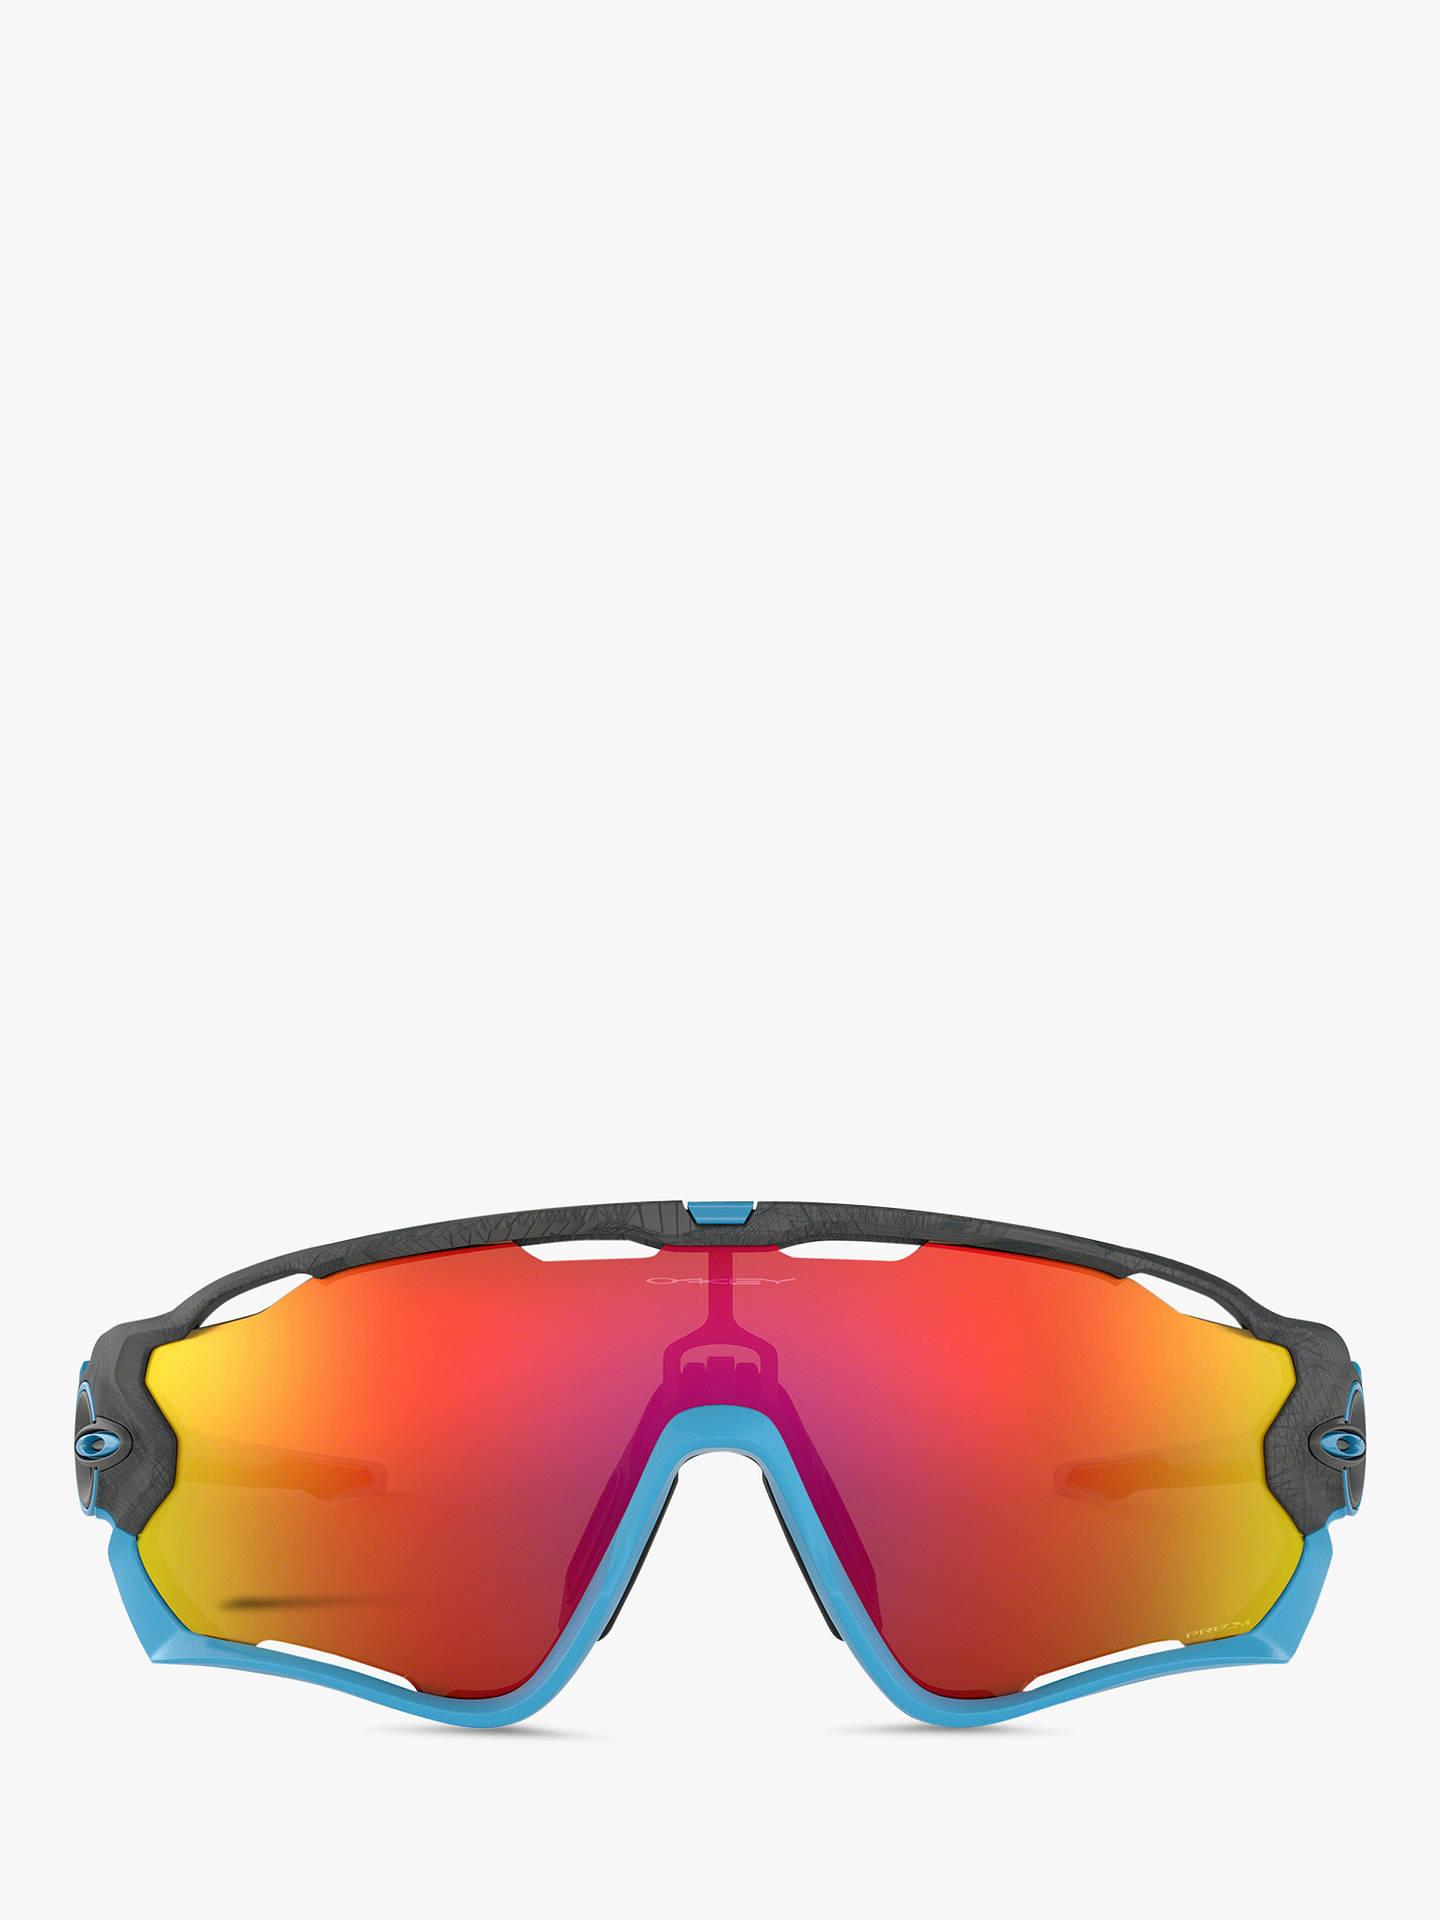 8ffb6f5b96 ... Buy Oakley OO9290 Men's Jawbreaker Prizm Rectangular Sunglasses, Grey  Blue/Mirror Red Online at ...